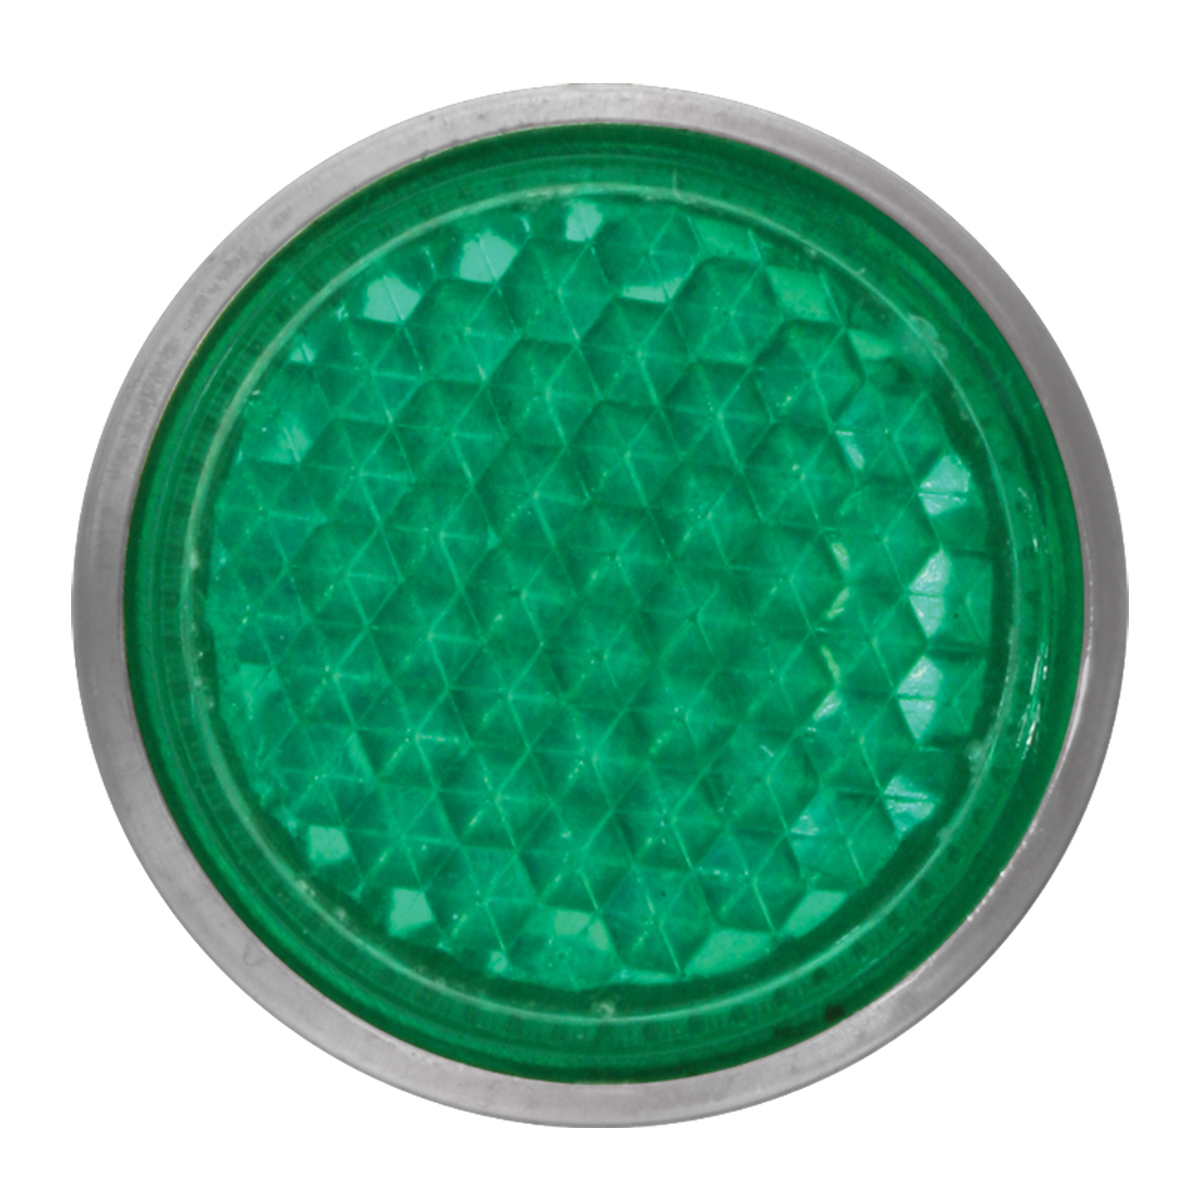 "Green 5/8"" Round Screw Type Mini Reflector"